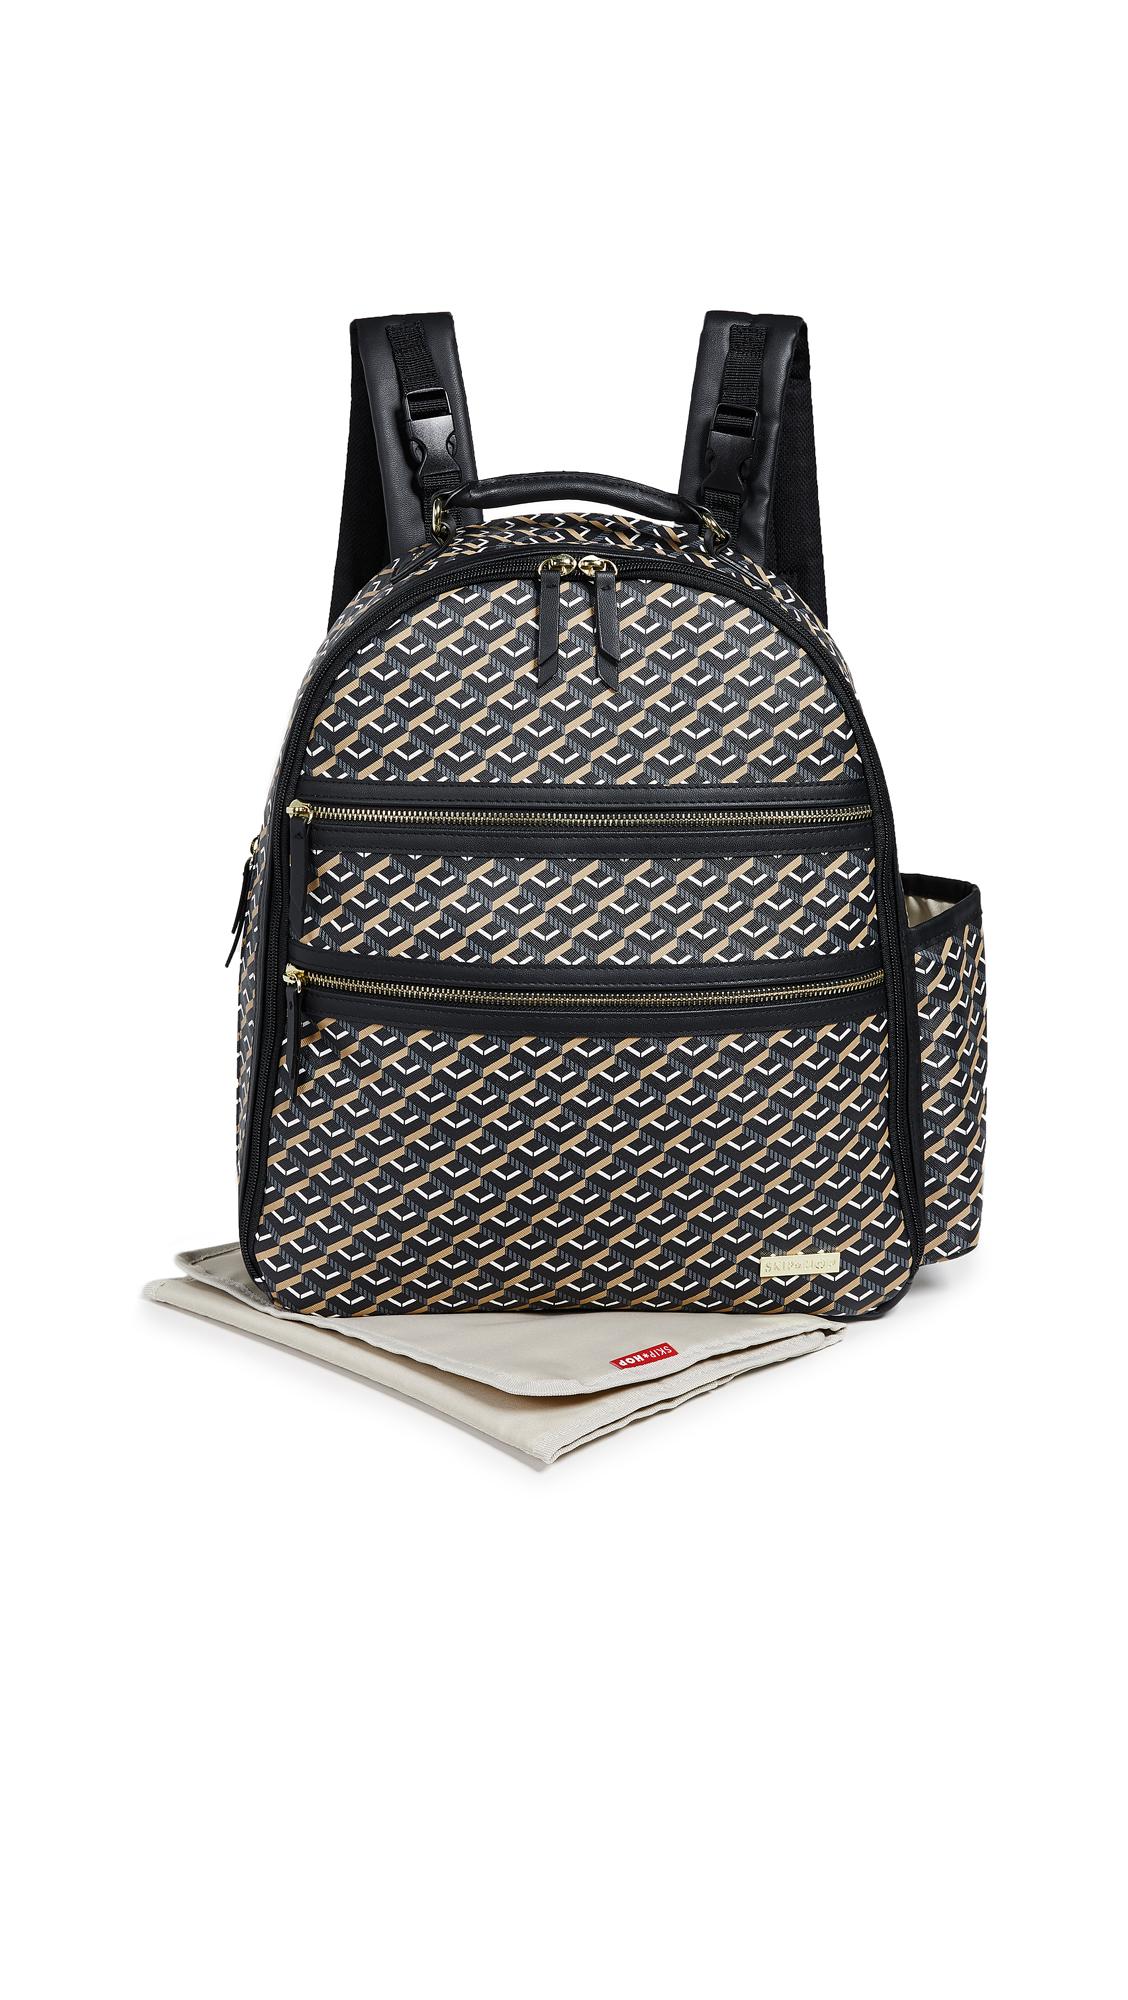 SKIP HOP Deco Saffiano Backpack in Multi